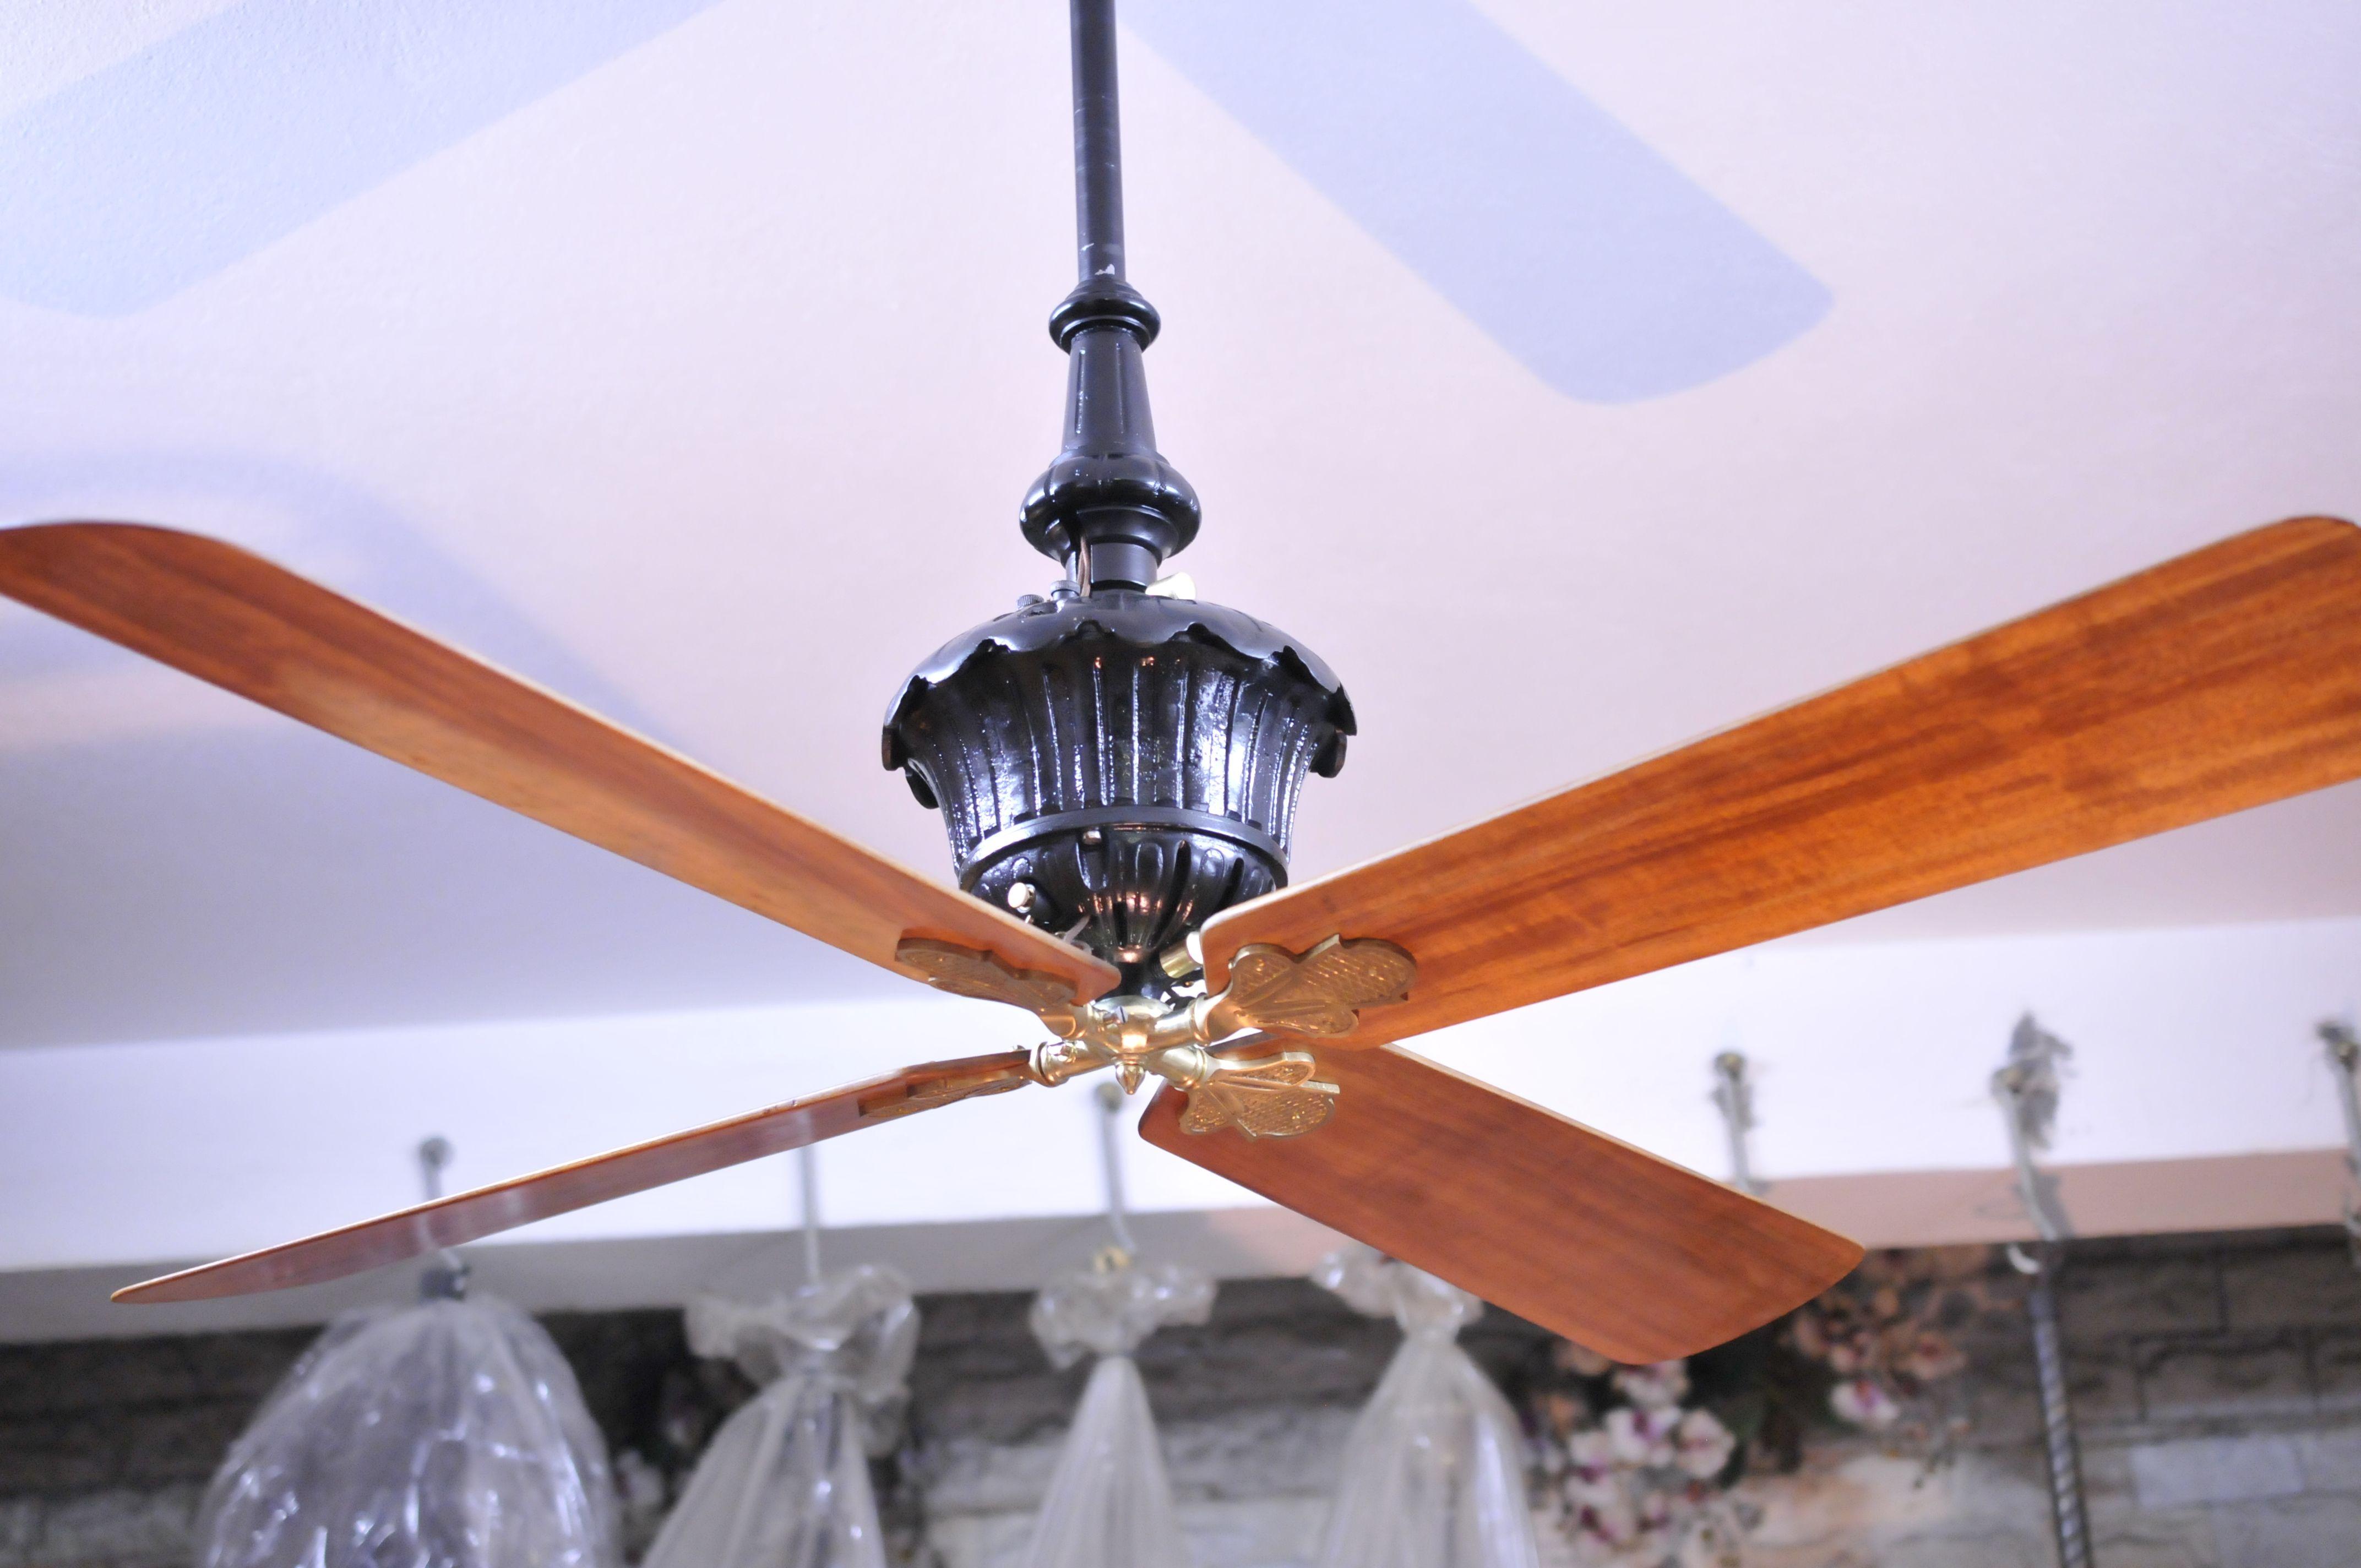 Marelli Breva ceiling fan Antique ceiling fans